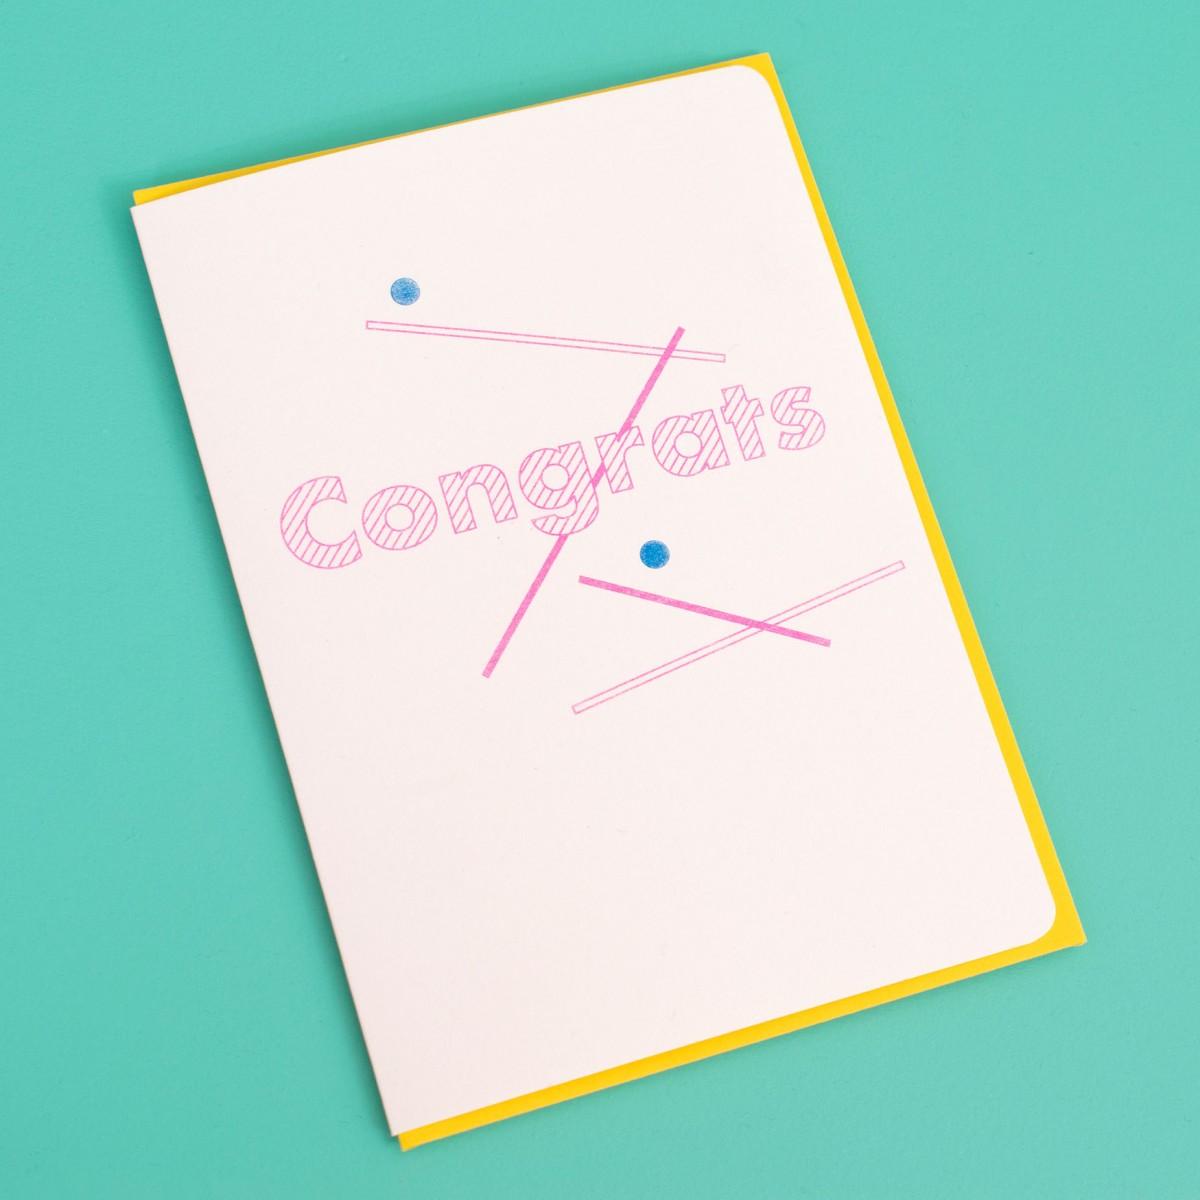 polypodium / congrats - Grußkarte - Risoduck